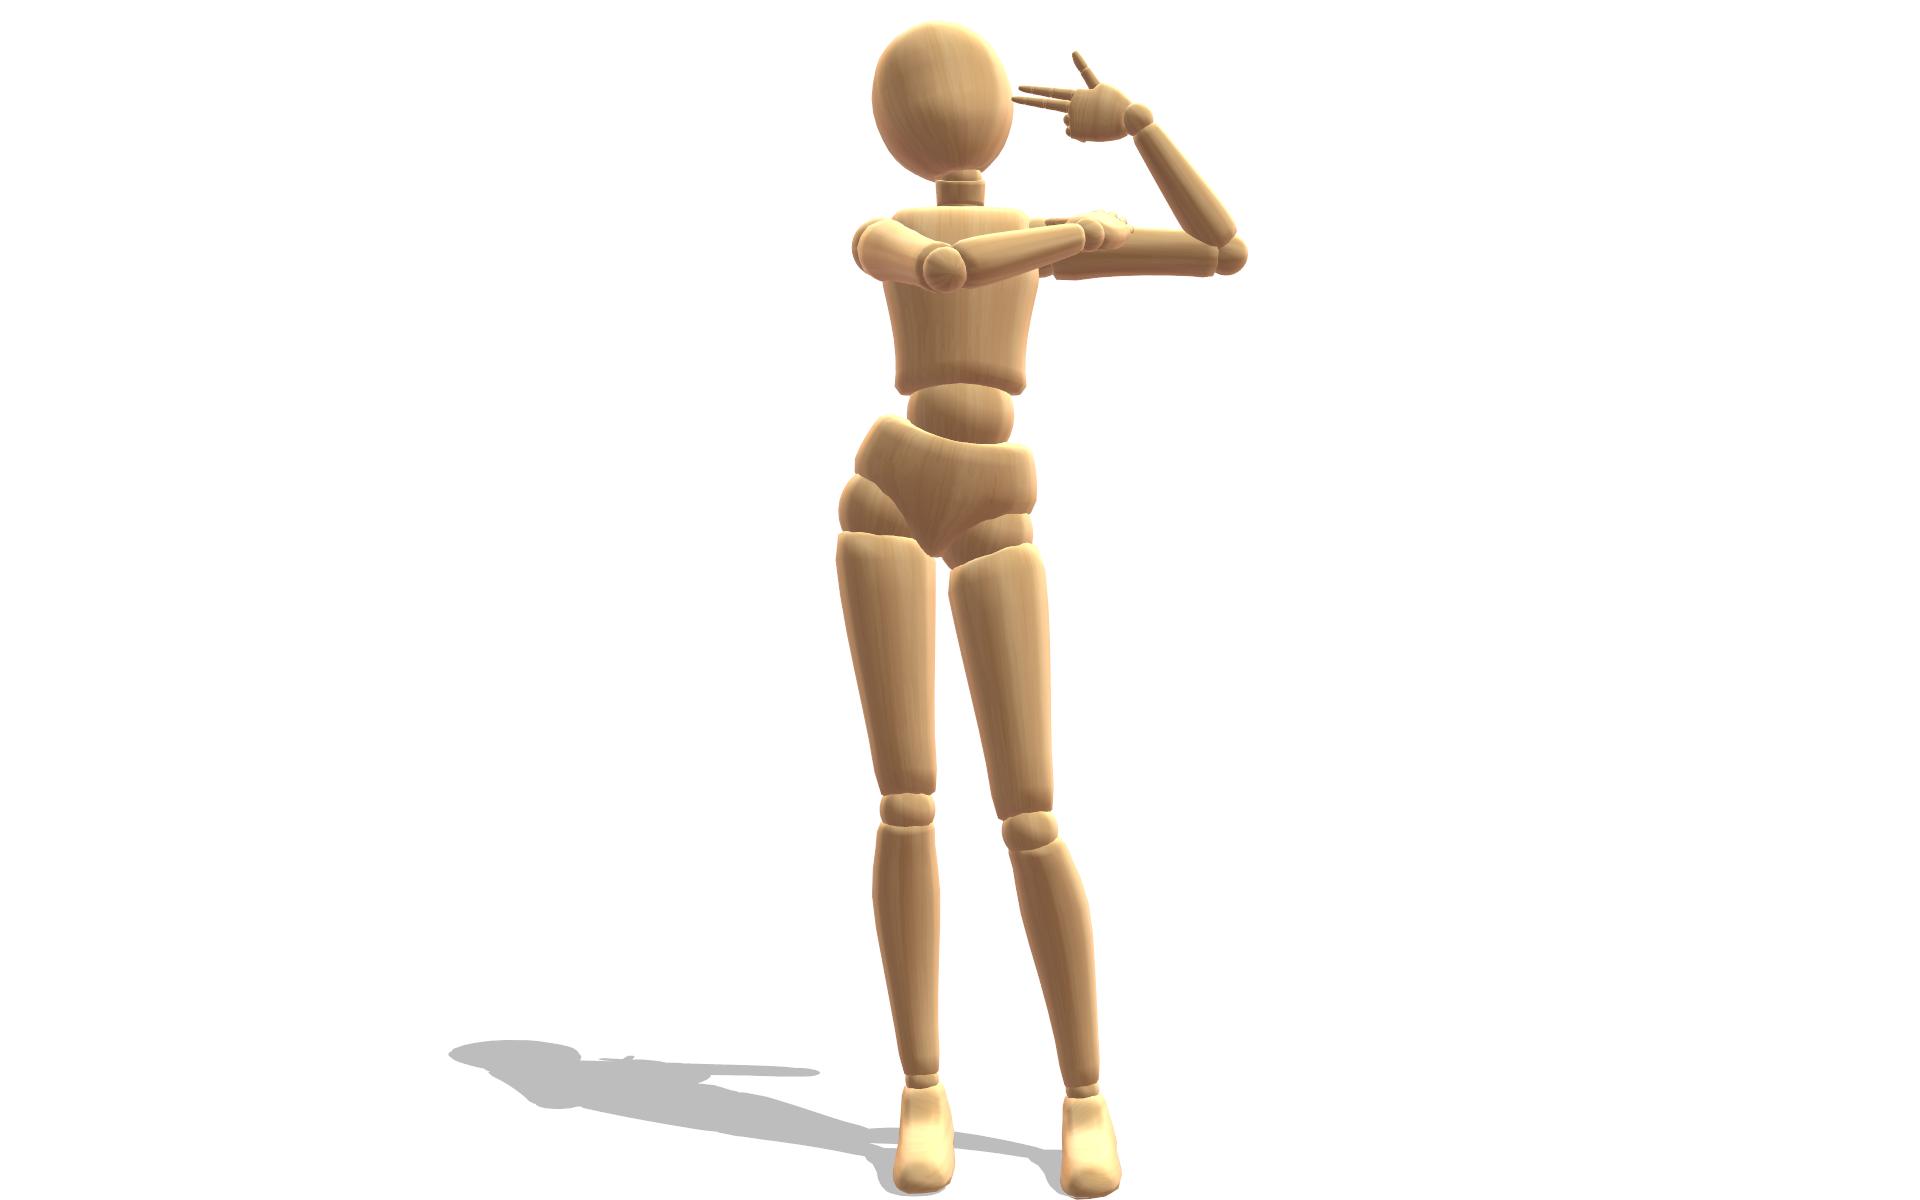 MMD] Shooting Pose by StrikingHope on DeviantArt